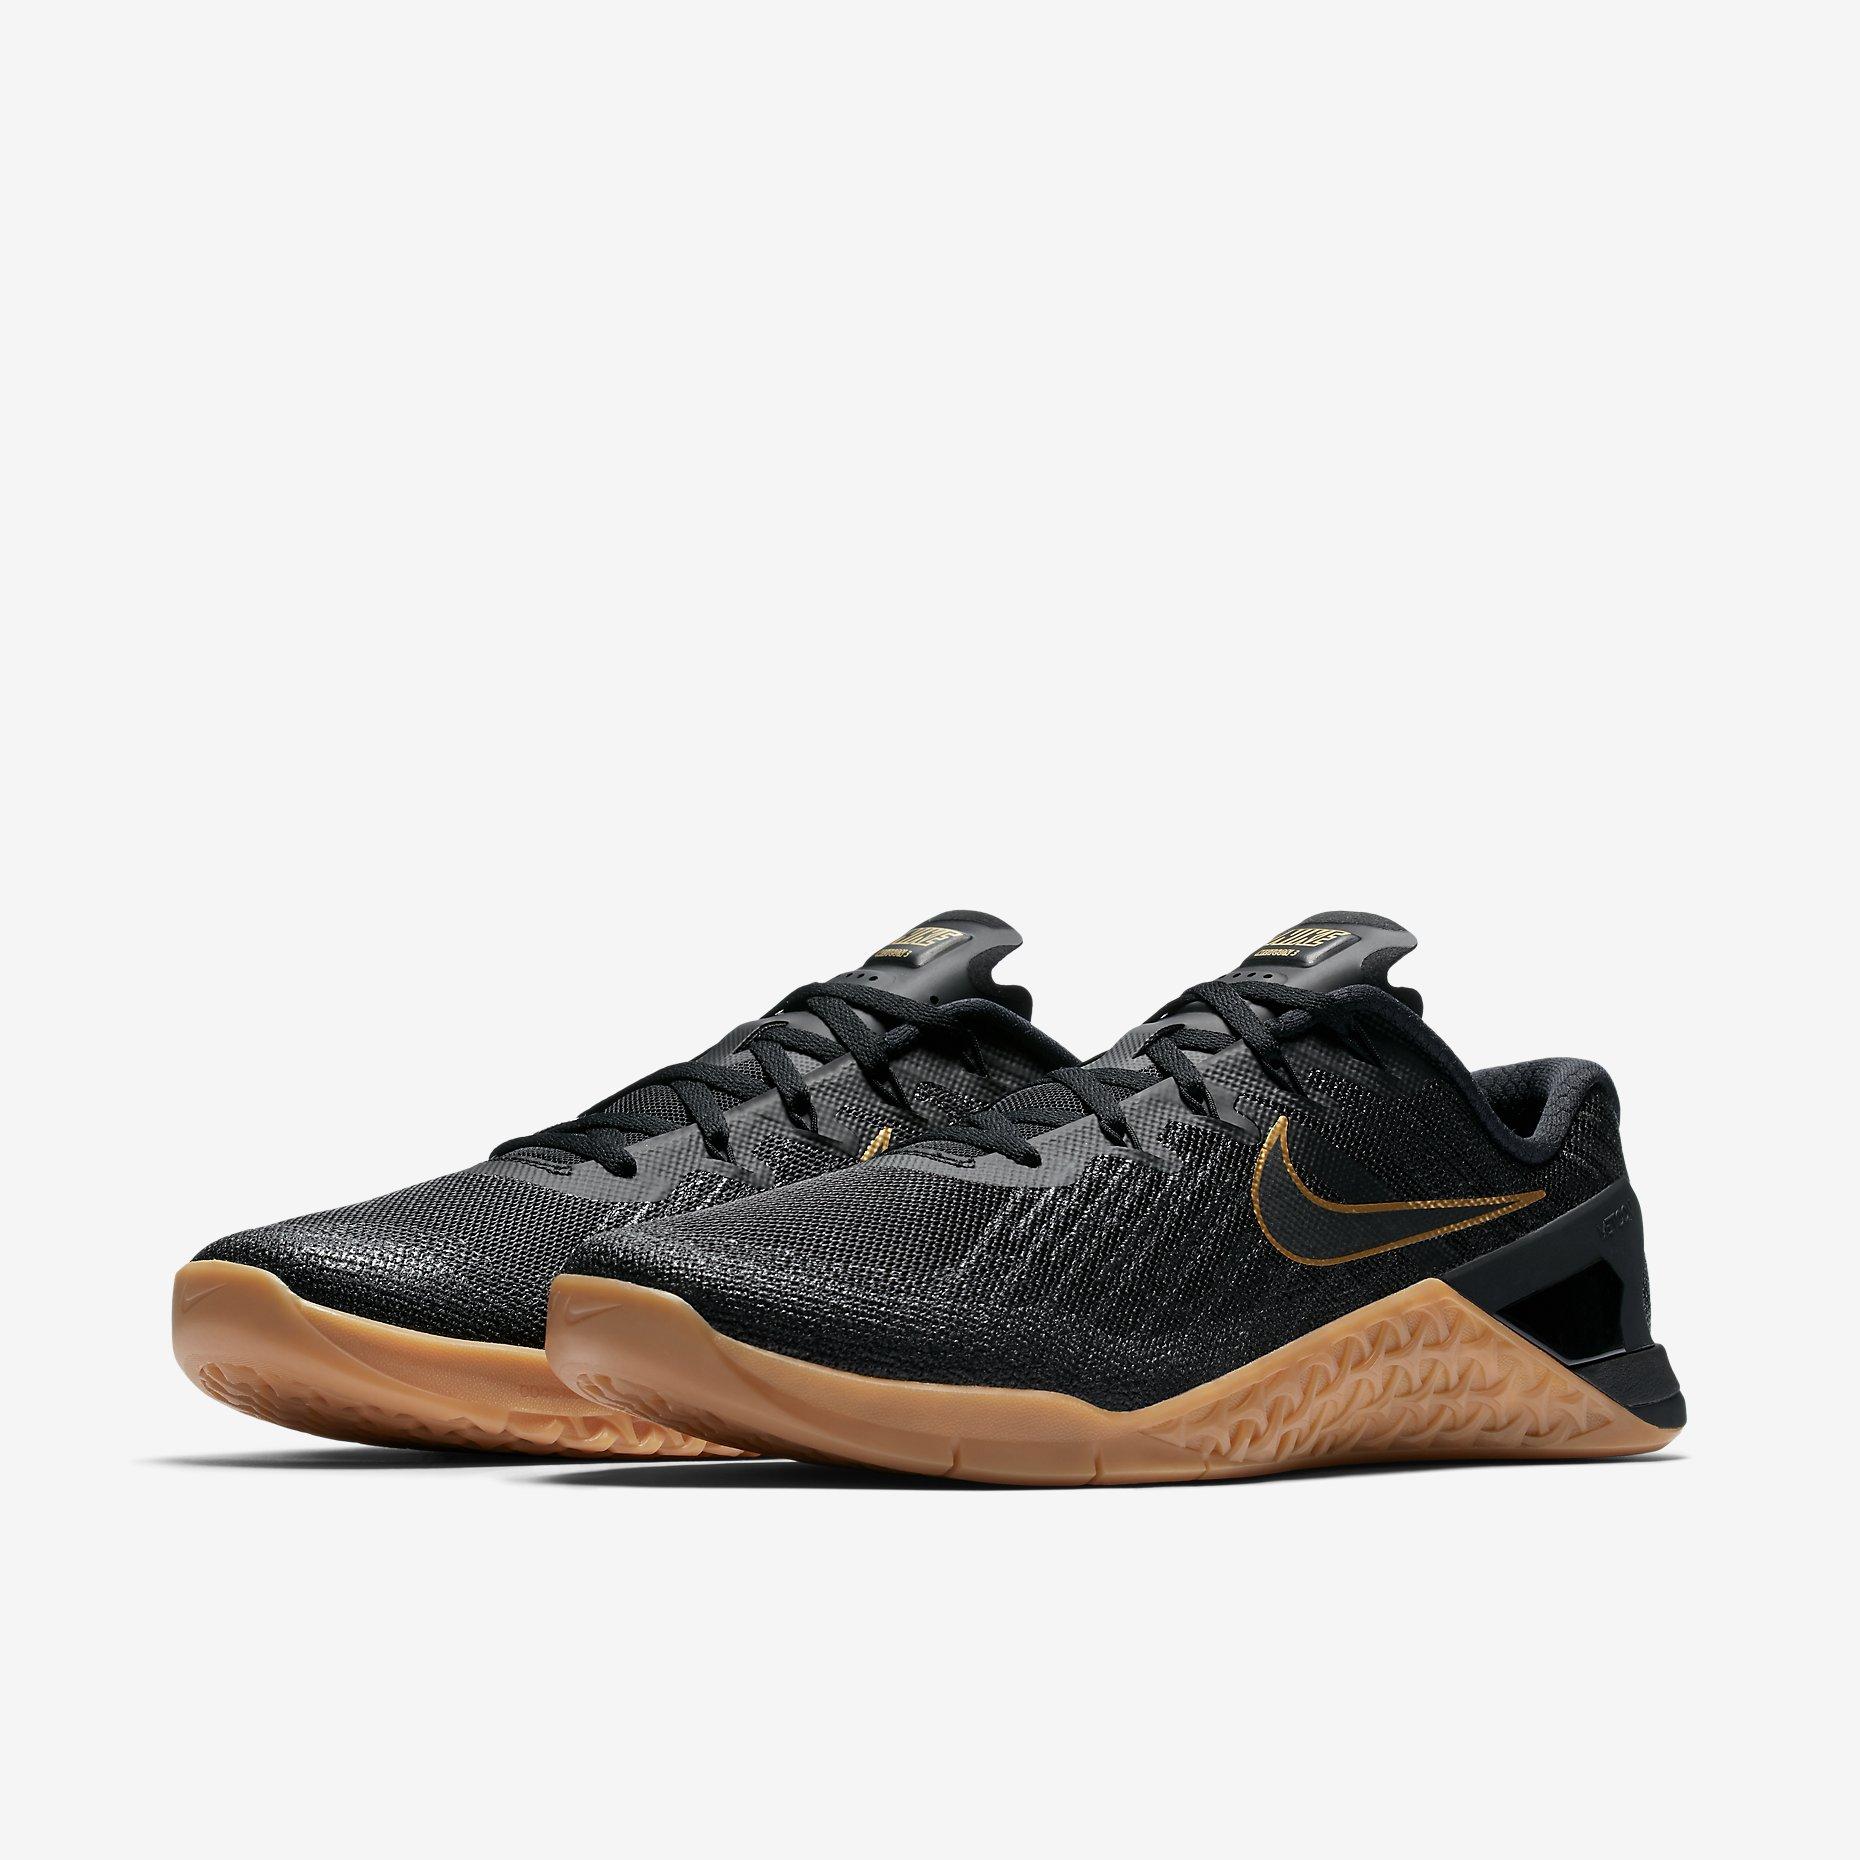 metcon-3-x-mens-training-shoe (4)